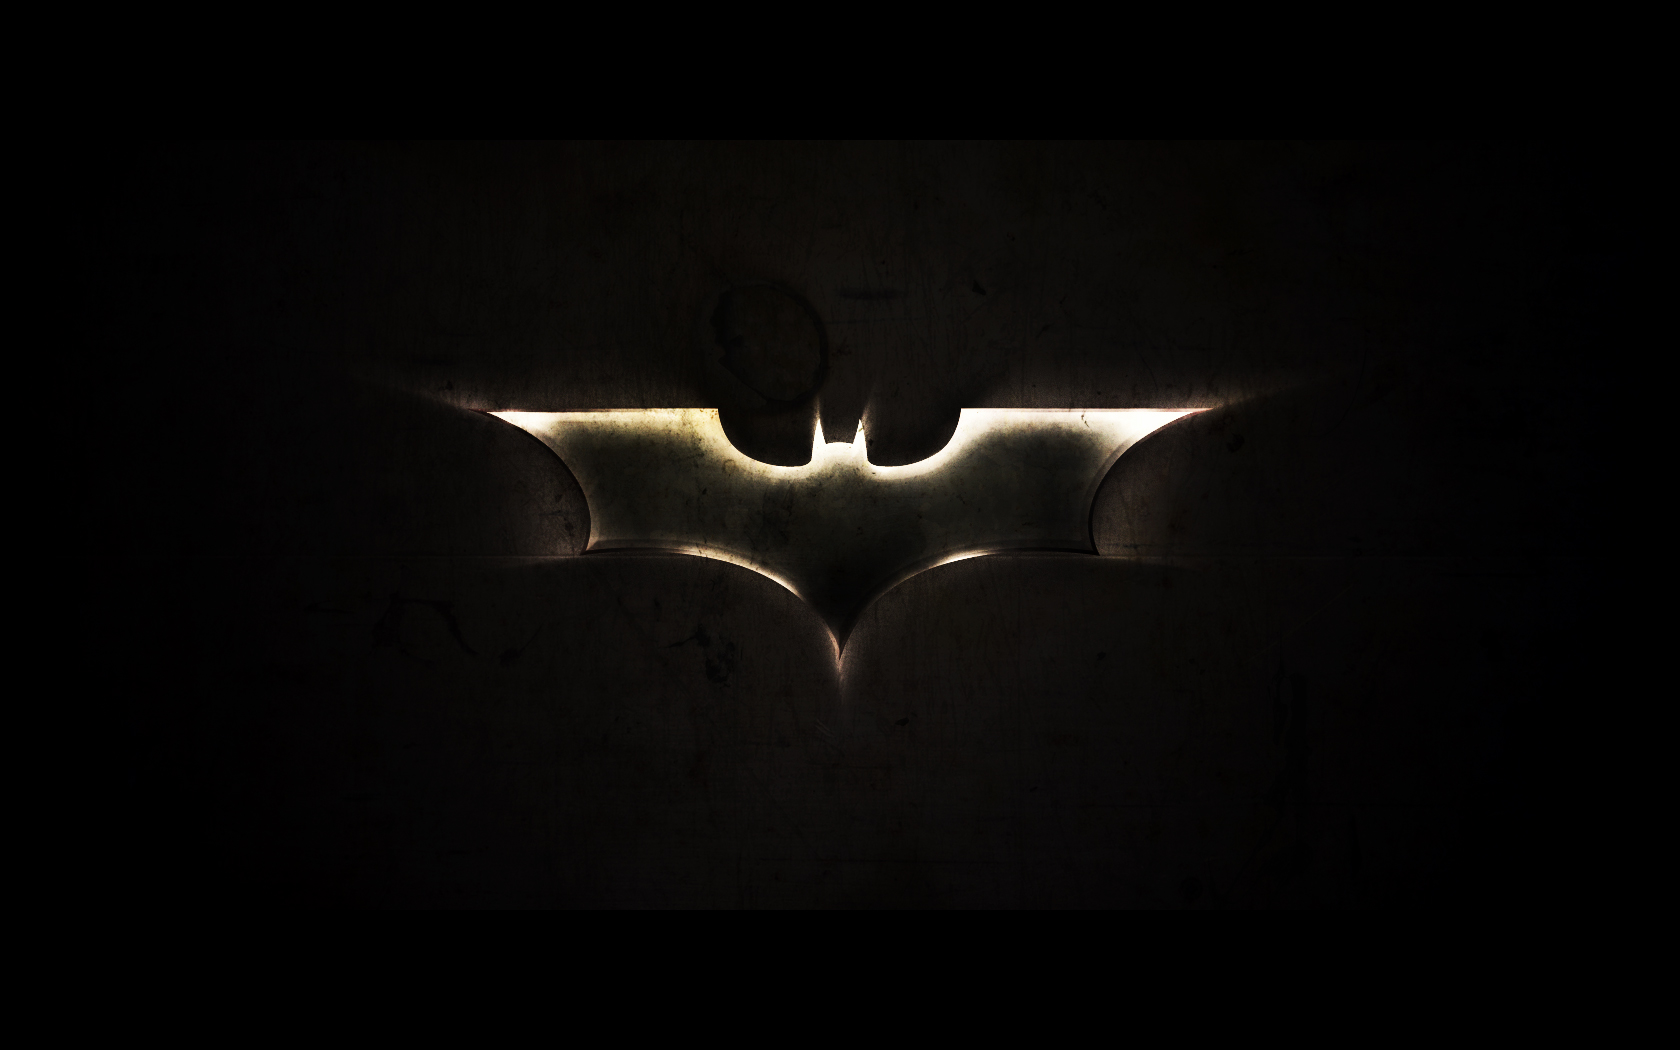 the dark knight rises catwoman concept art. #39;The Dark Knight Rises#39;